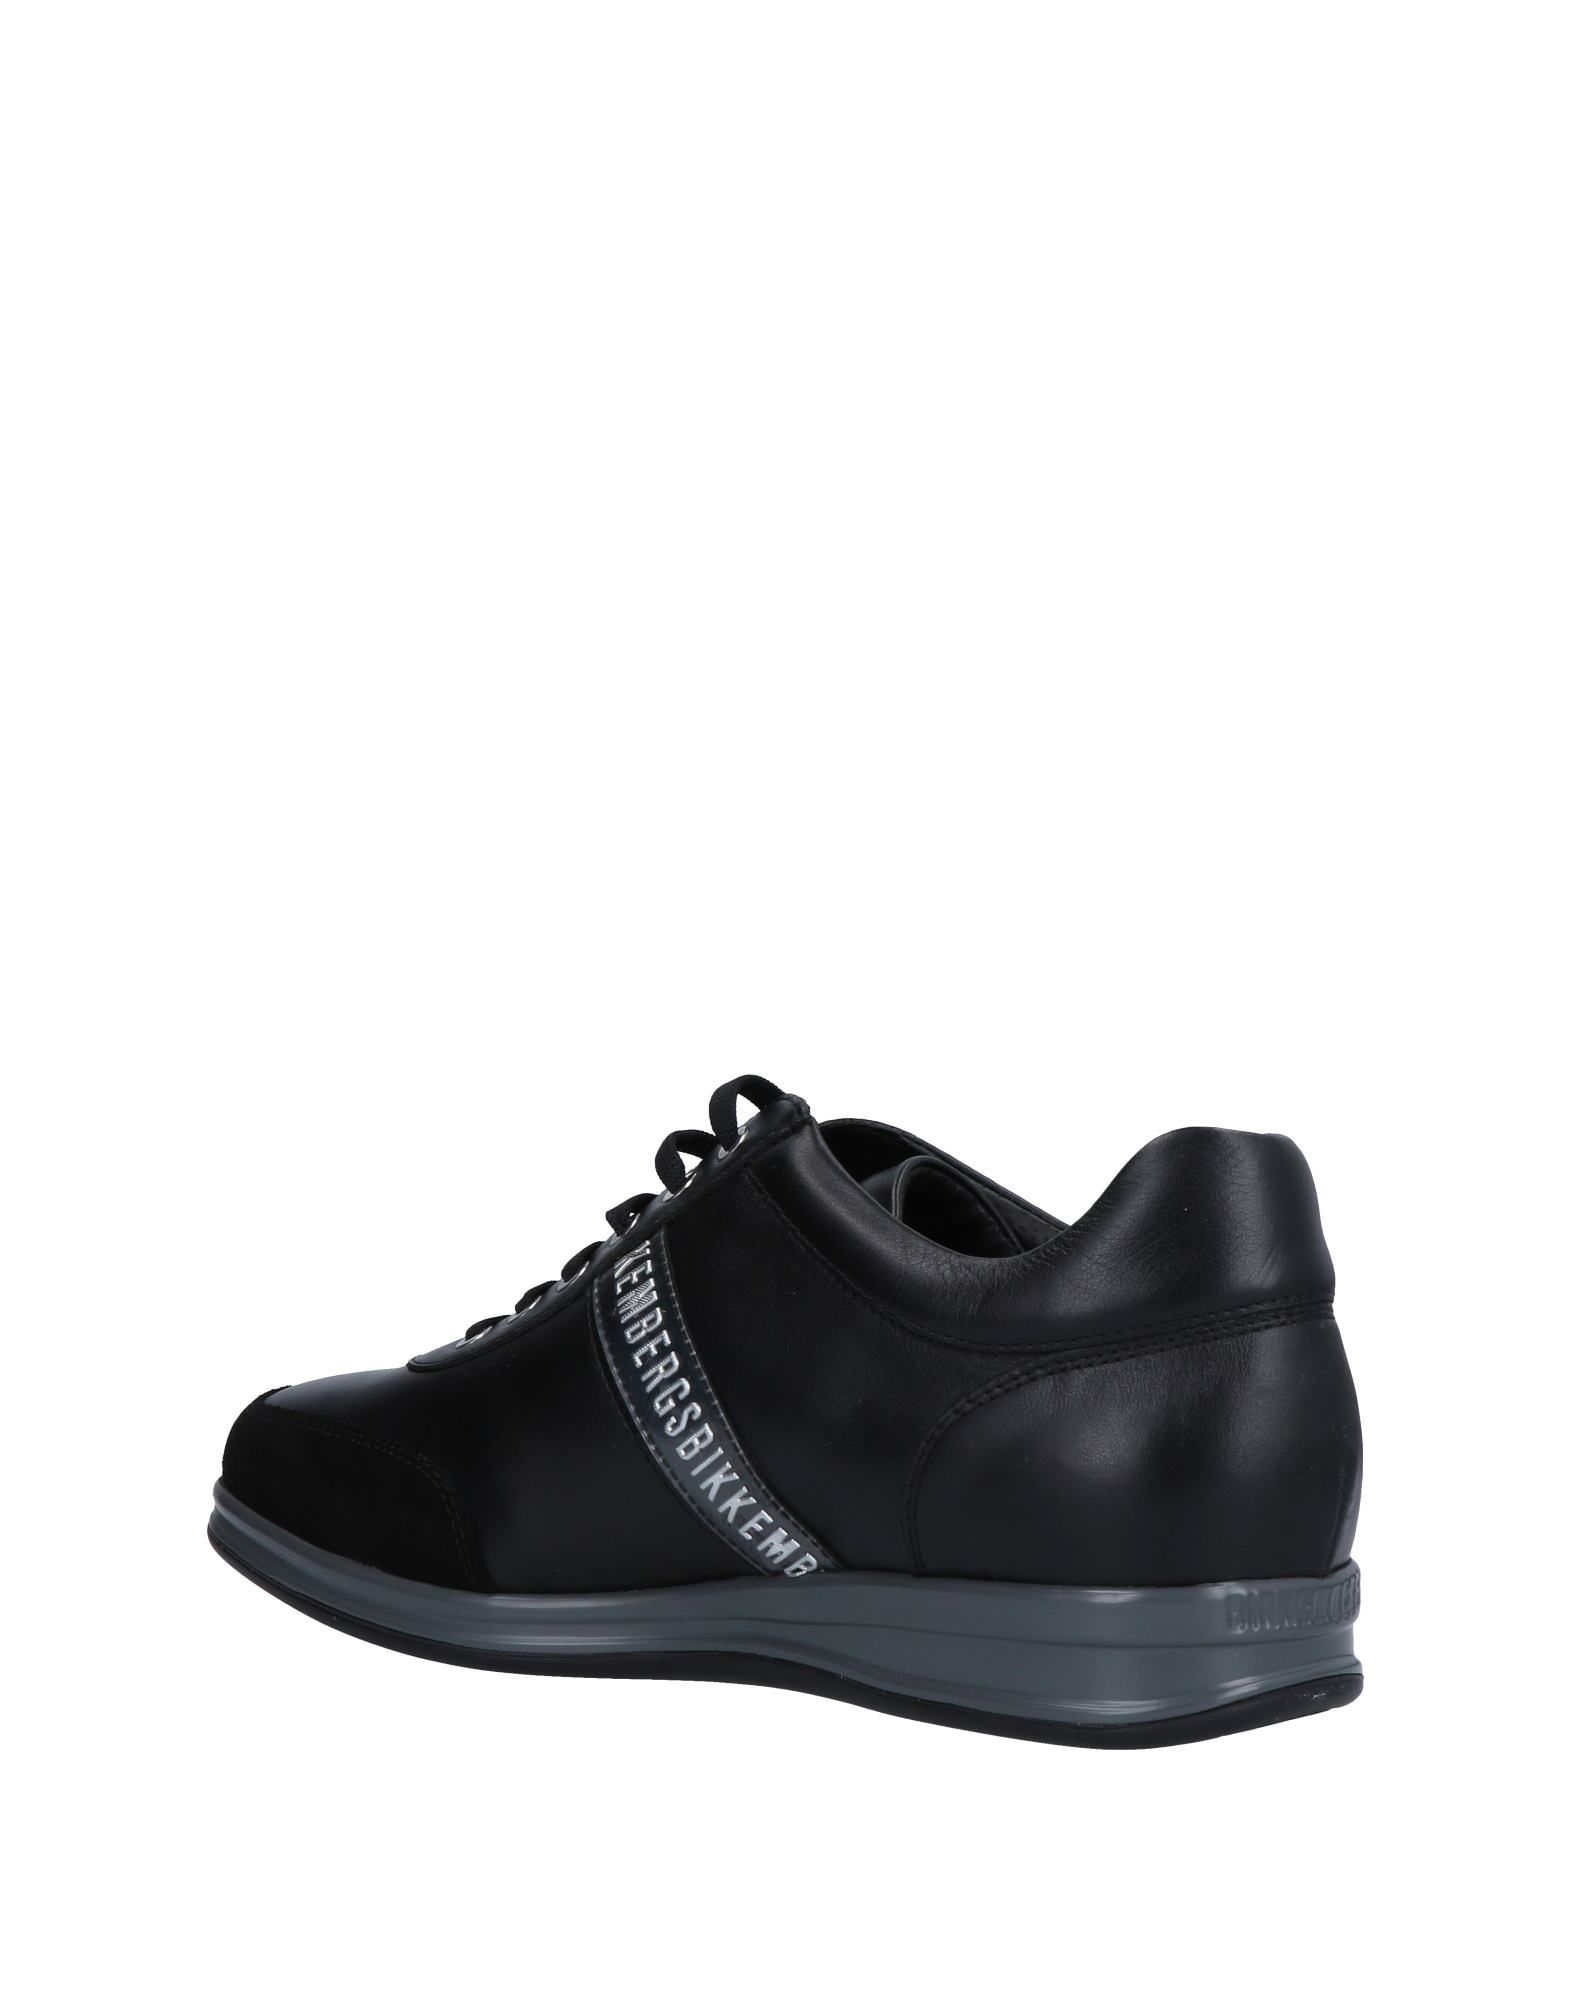 Bikkembergs Sneakers Gute Herren  11522202WW Gute Sneakers Qualität beliebte Schuhe b8d8e6